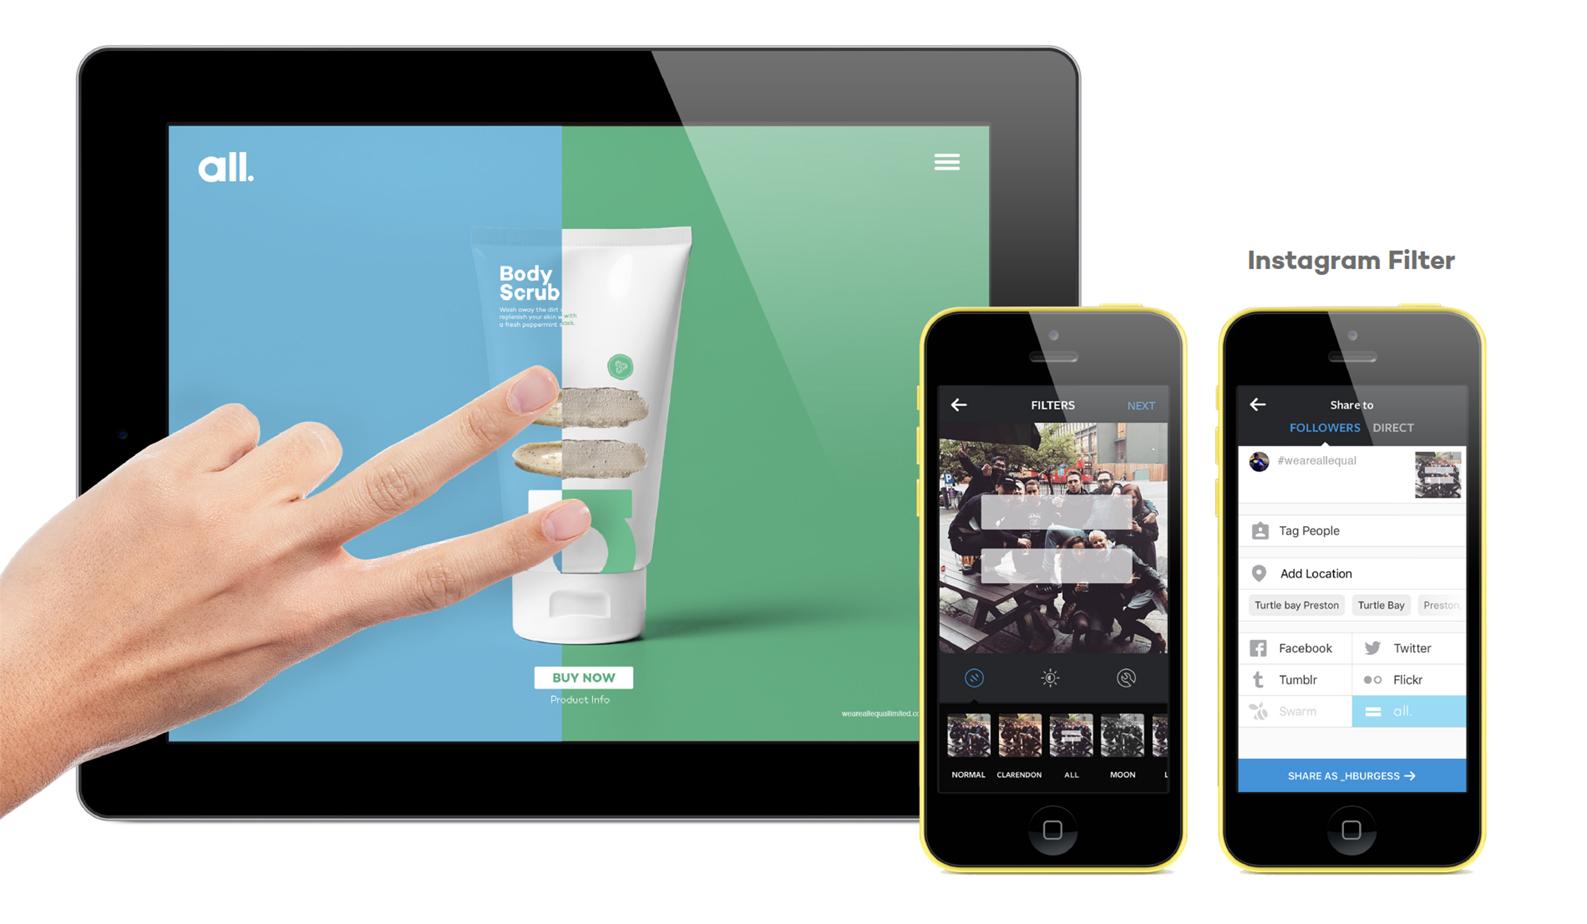 Finger swipe navigation & instagram filter concept - 'capture your moments of equality'